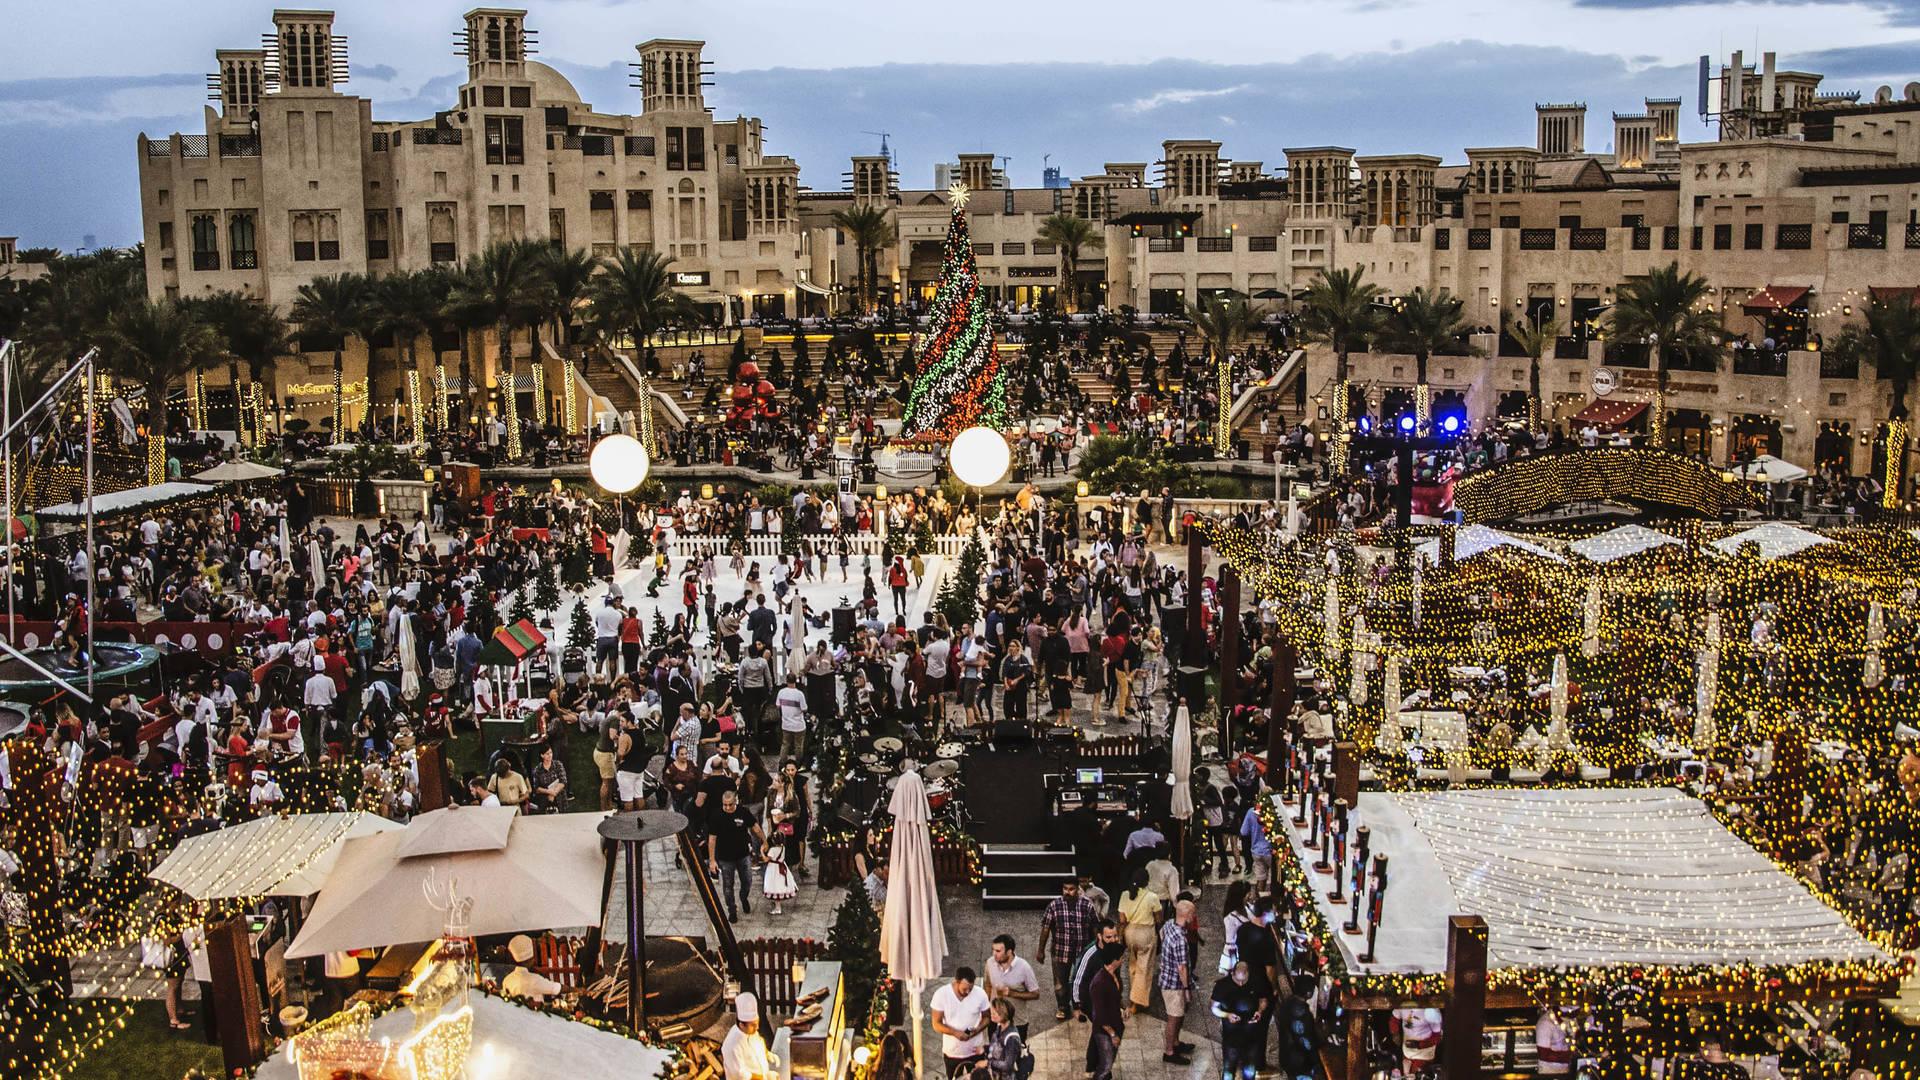 Madinat Jumeirah Bavarian festive market